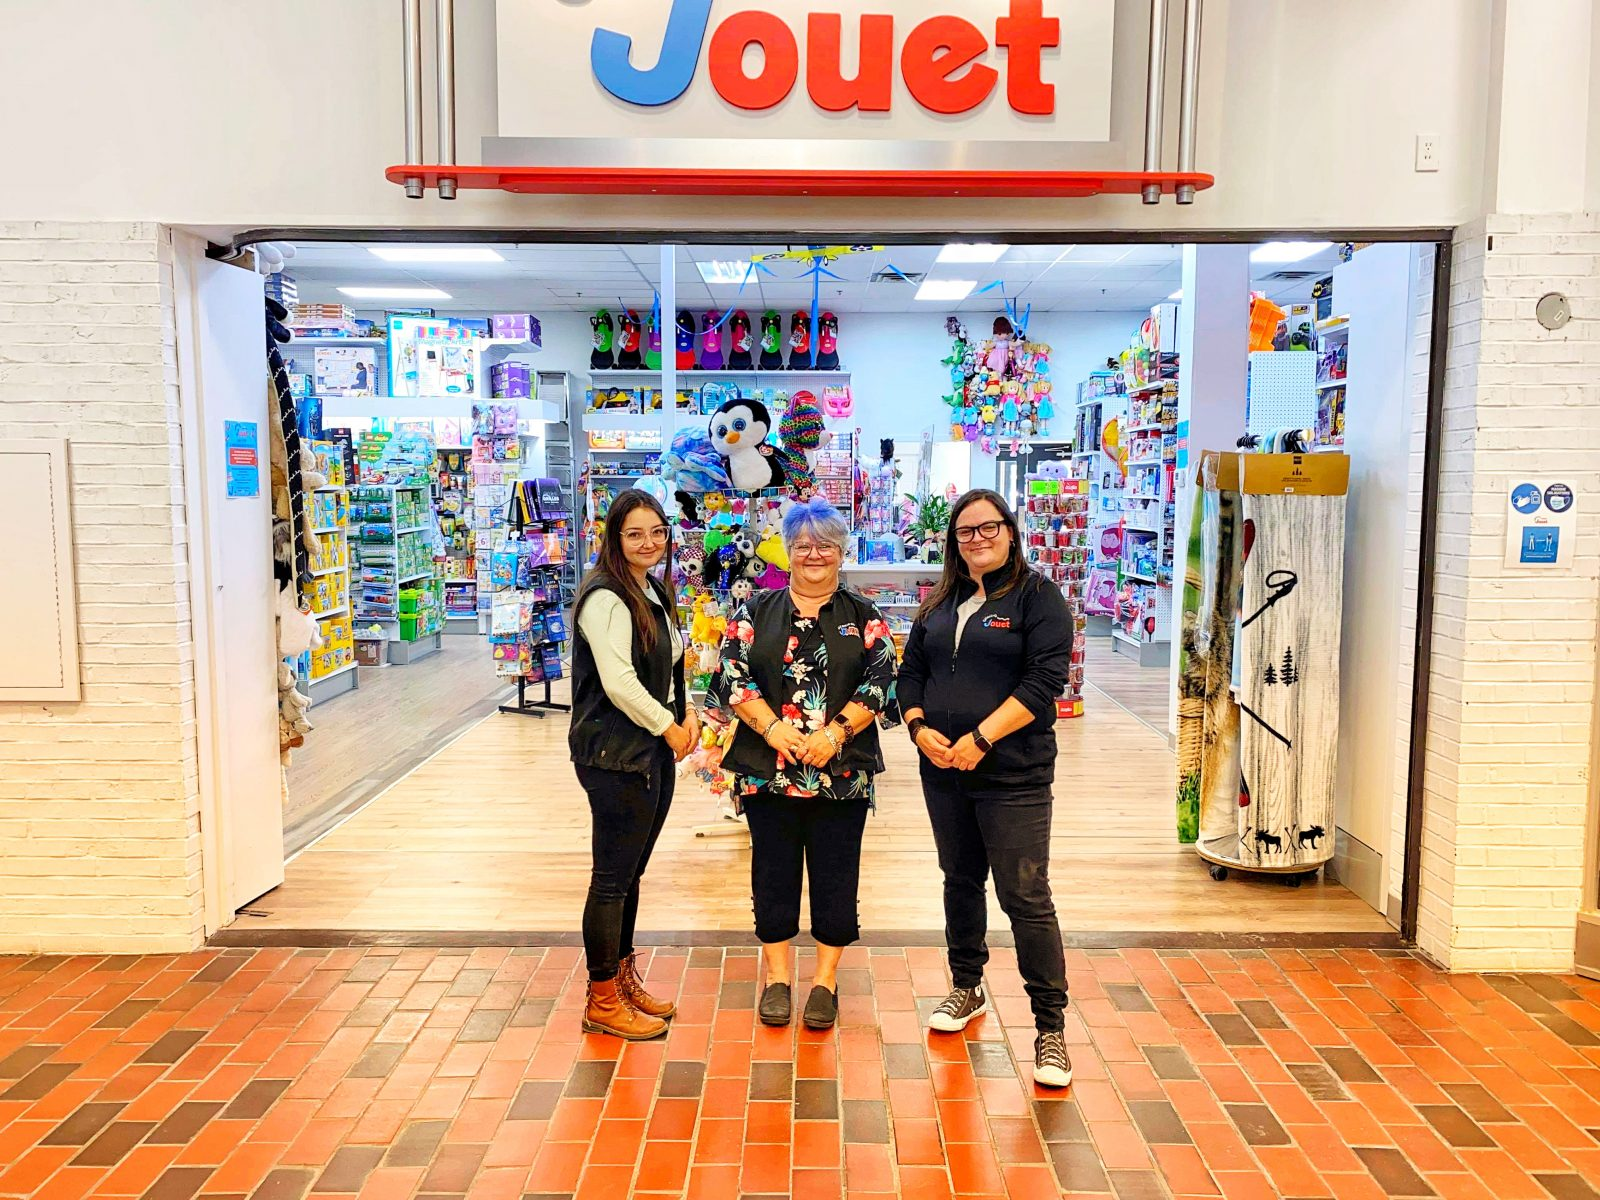 Investissement de 200000 $: La Galerie du jouet inaugure son agrandissement